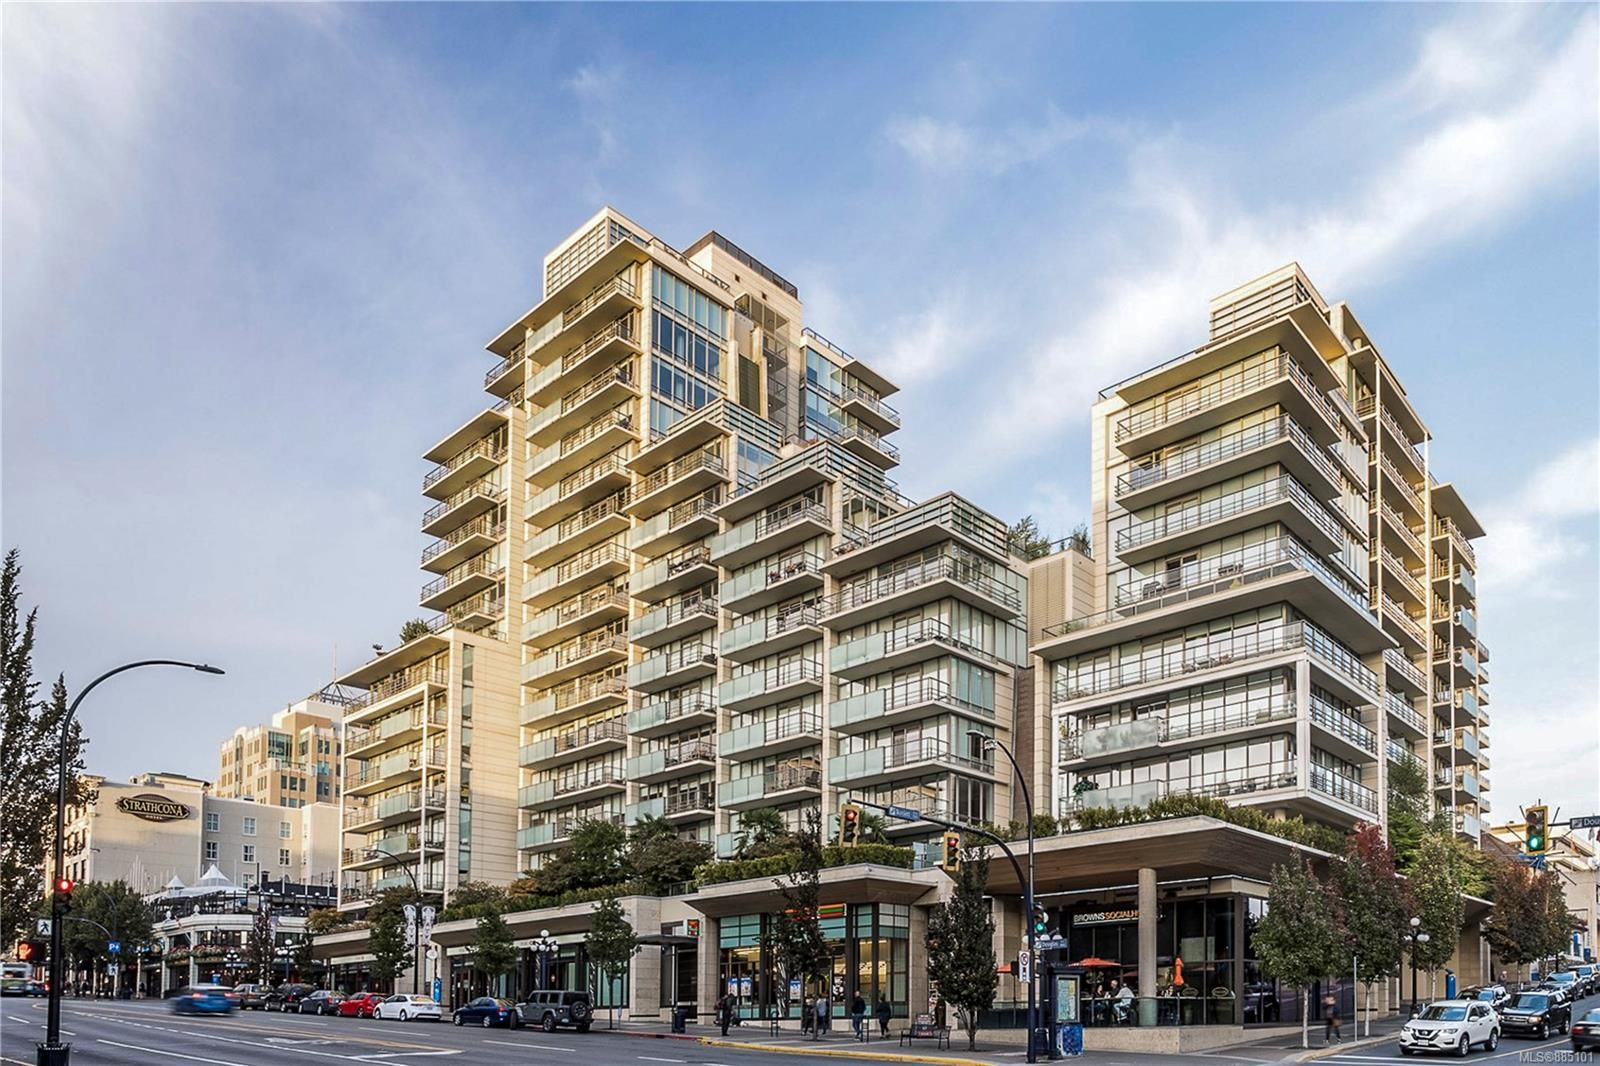 Main Photo: 408 707 Courtney St in : Vi Downtown Condo for sale (Victoria)  : MLS®# 885101